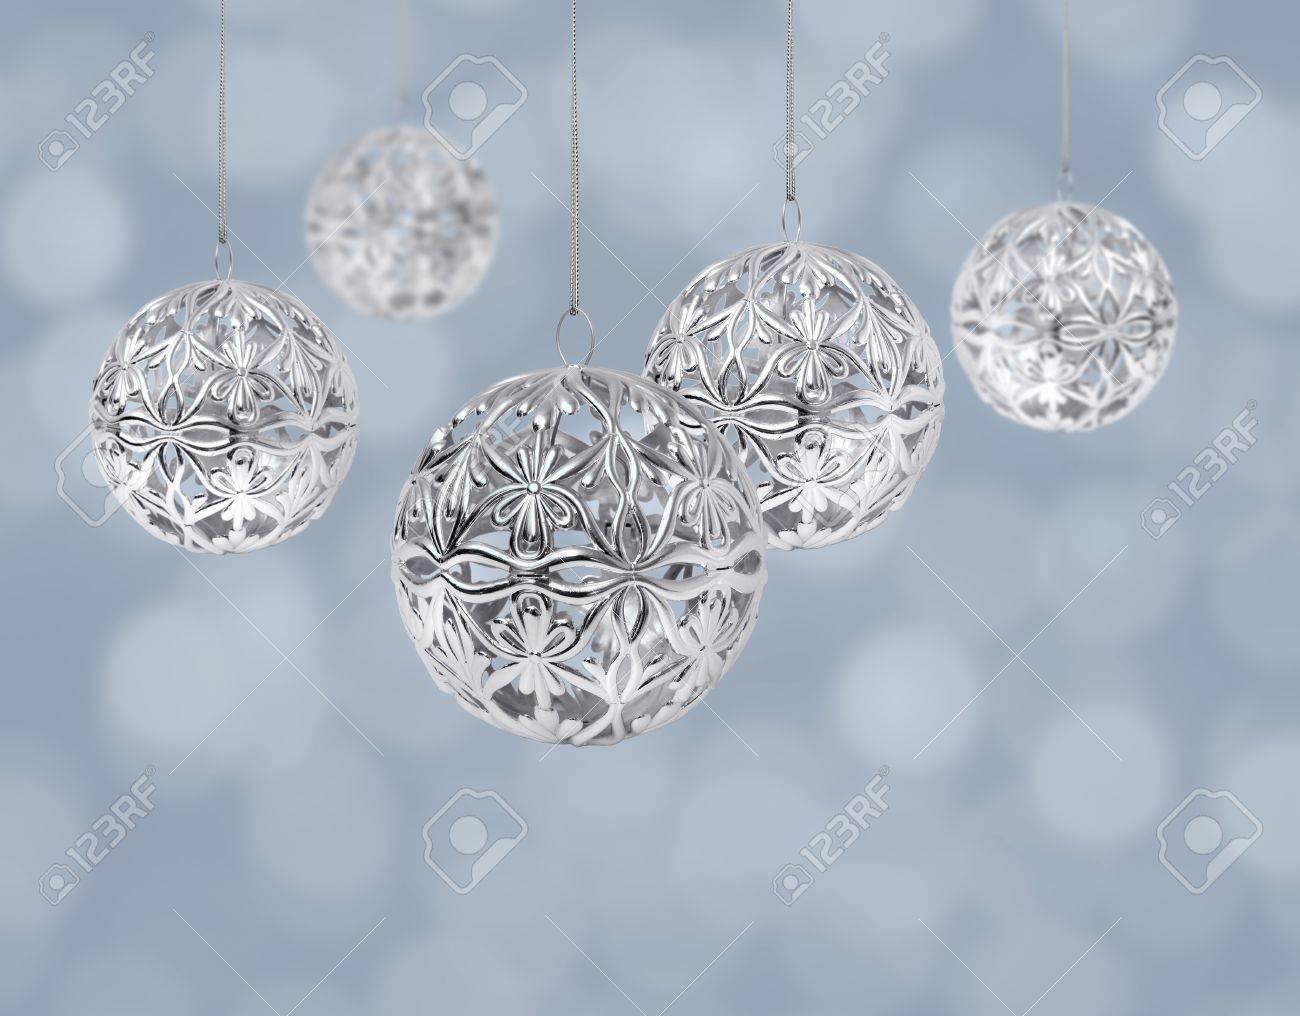 Shiny silver Christmas balls hanging on light blue background Stock Photo - 8331447